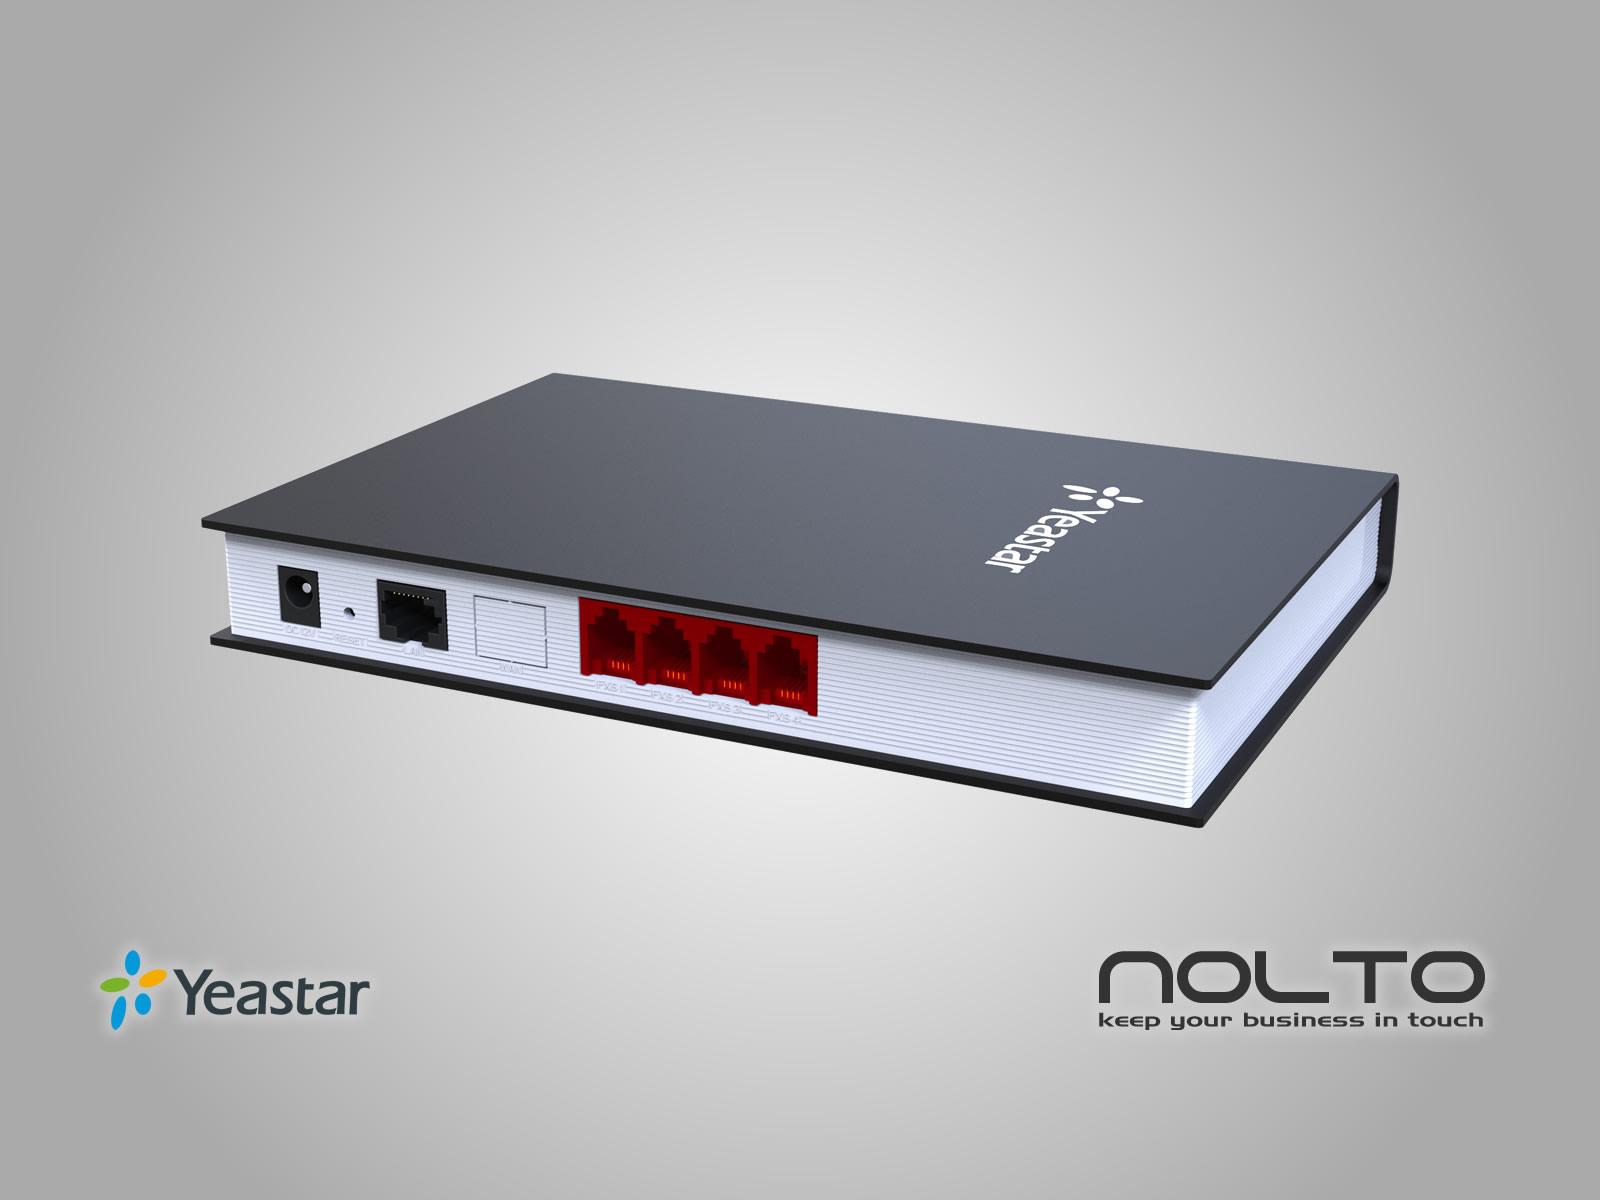 Yeastar TA410 FXO GW Arka